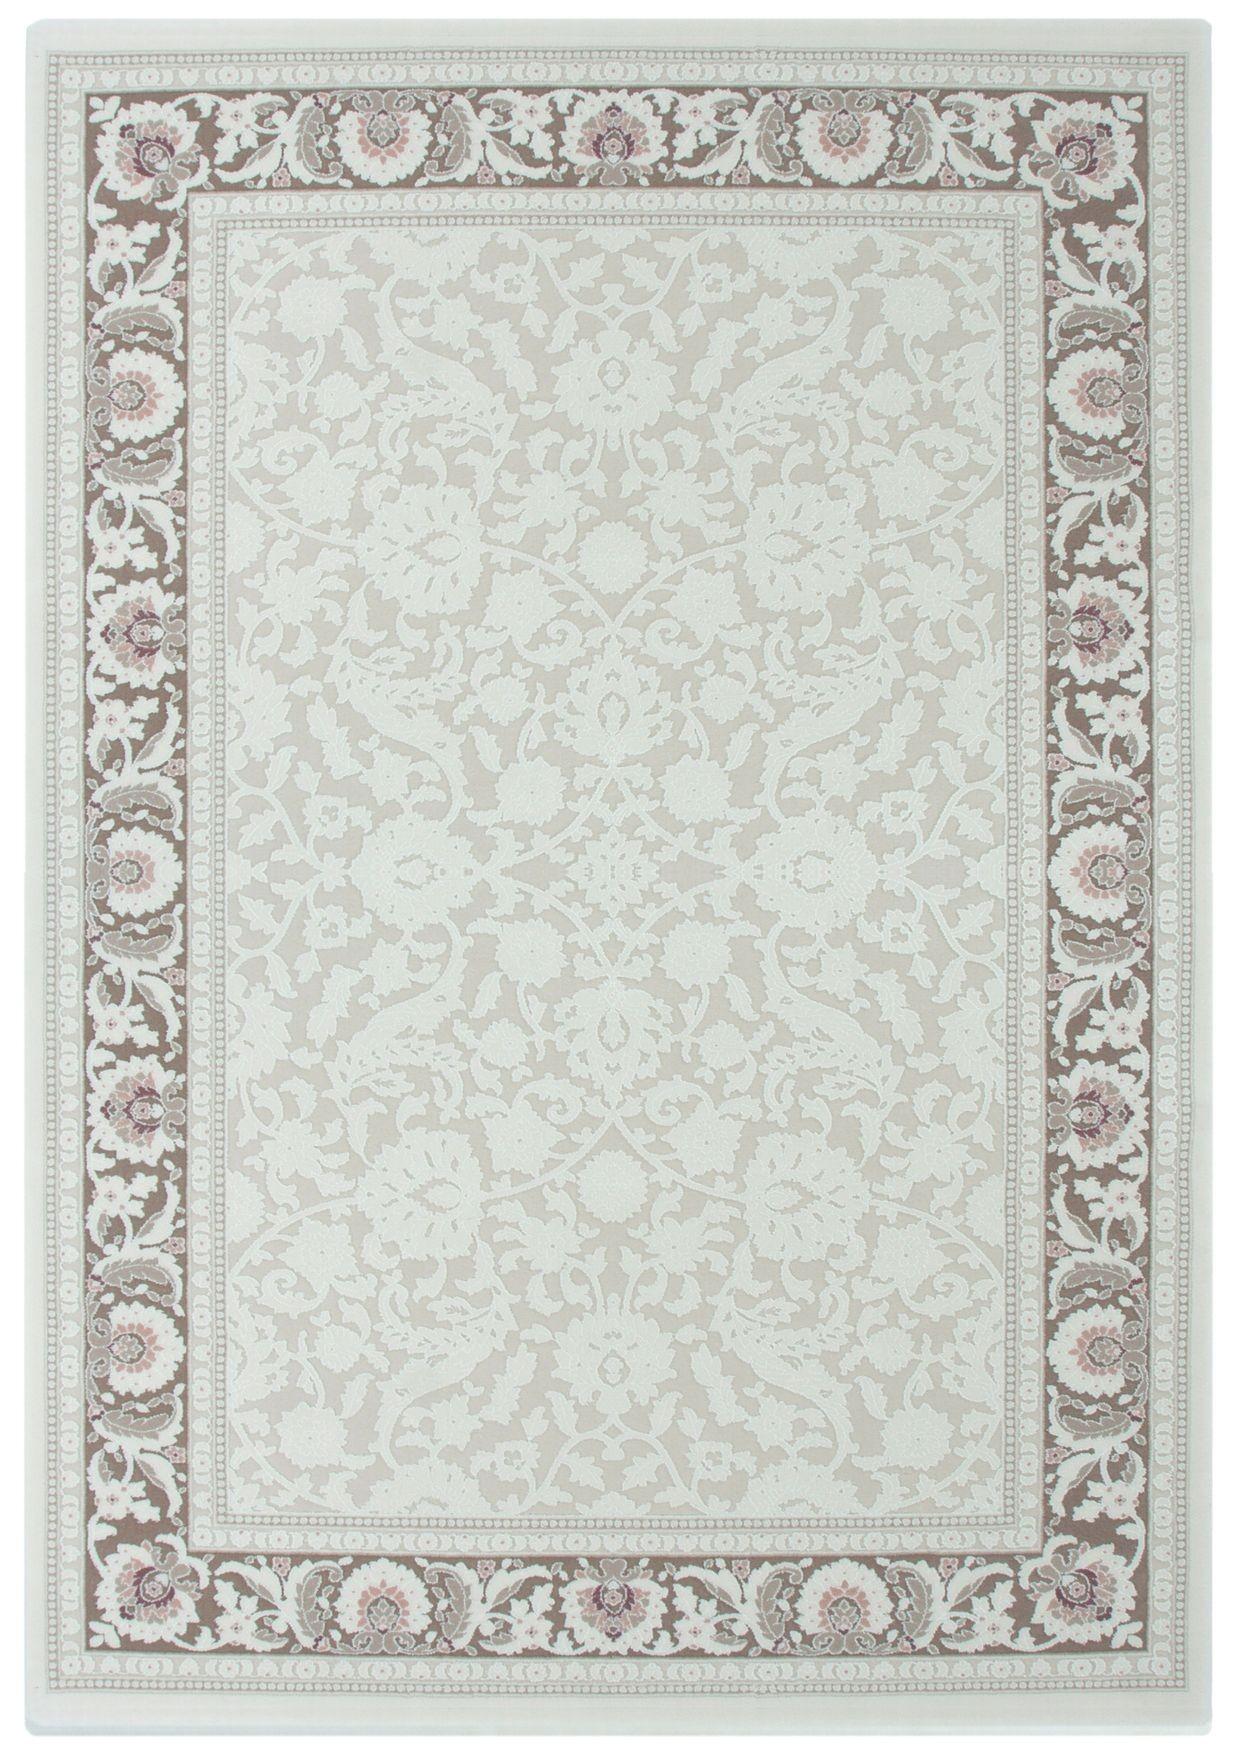 tapis en acrylique style baroque avec cr me taupe prada 2. Black Bedroom Furniture Sets. Home Design Ideas